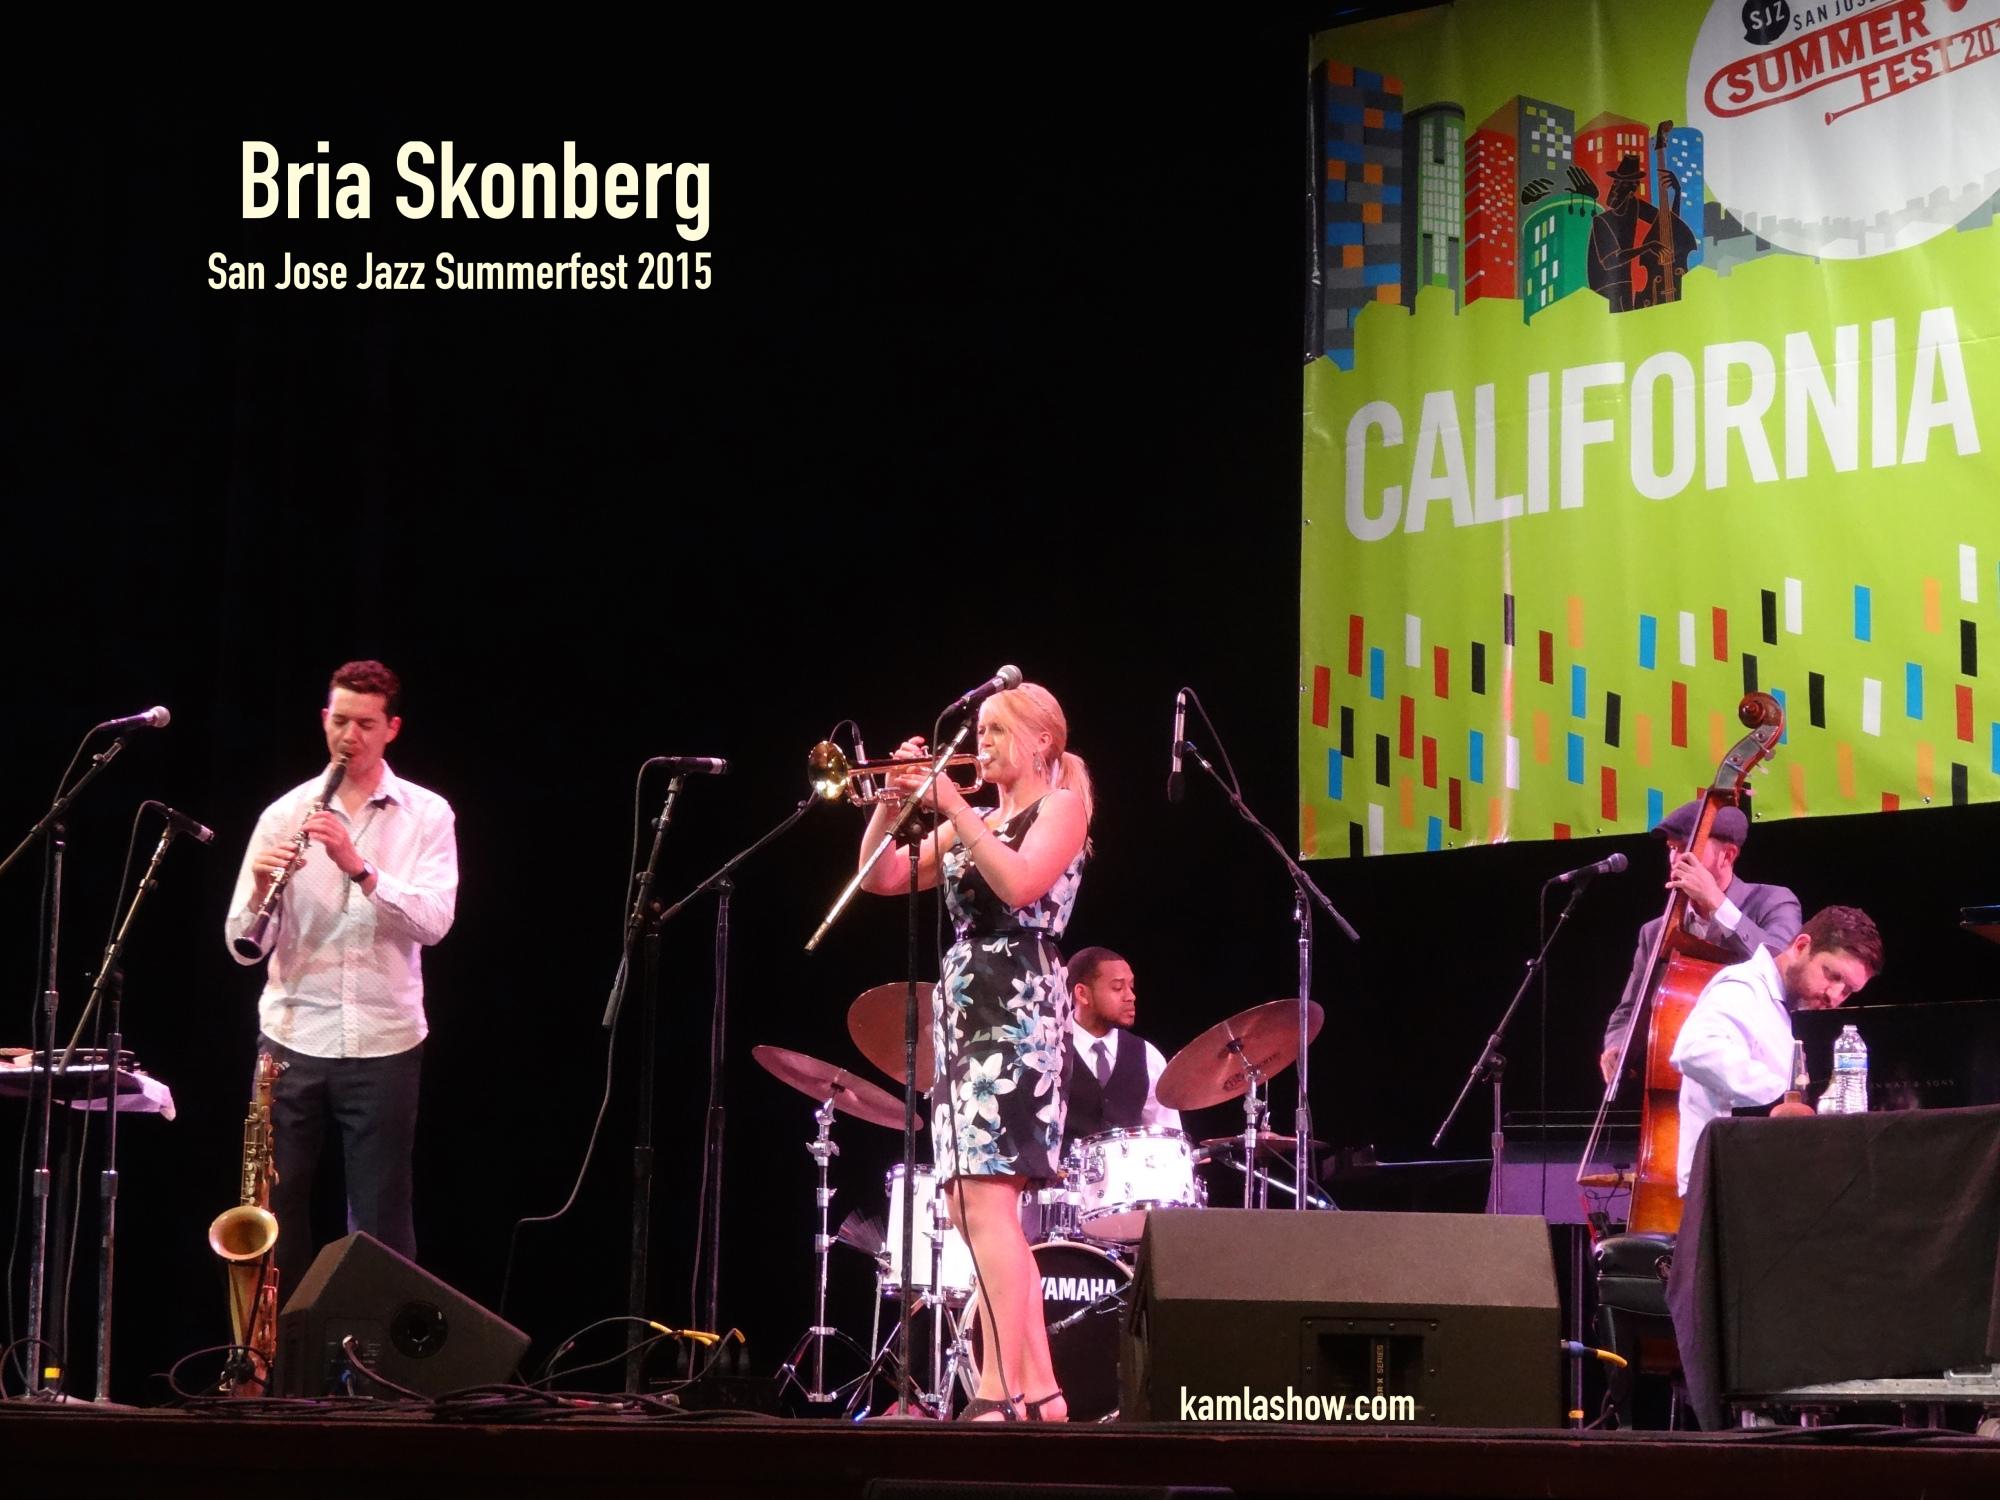 San Jose Jazz Festival/http://kamlashow.com/